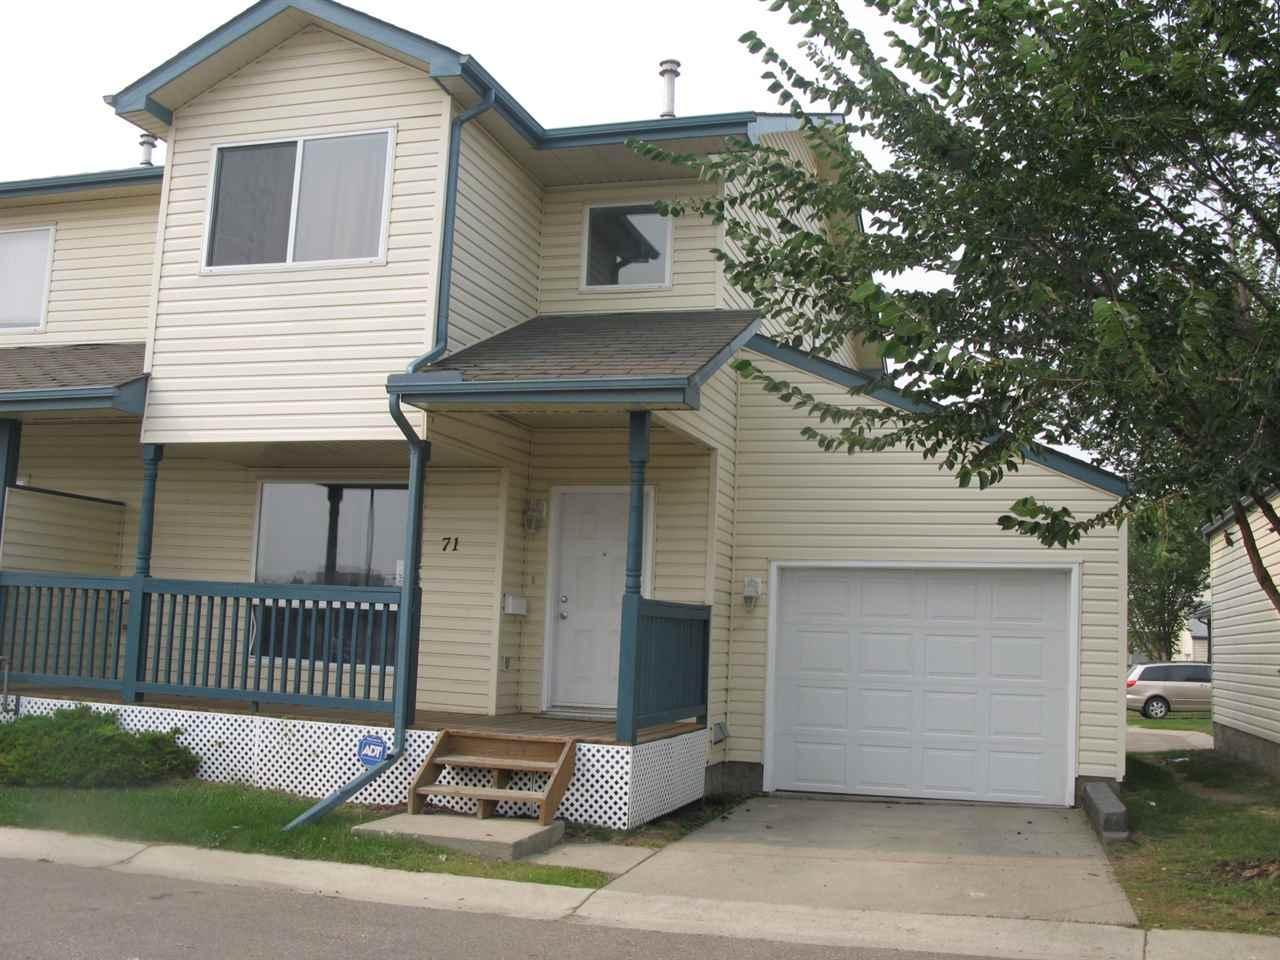 Buliding: 10909 106 Street, Edmonton, AB